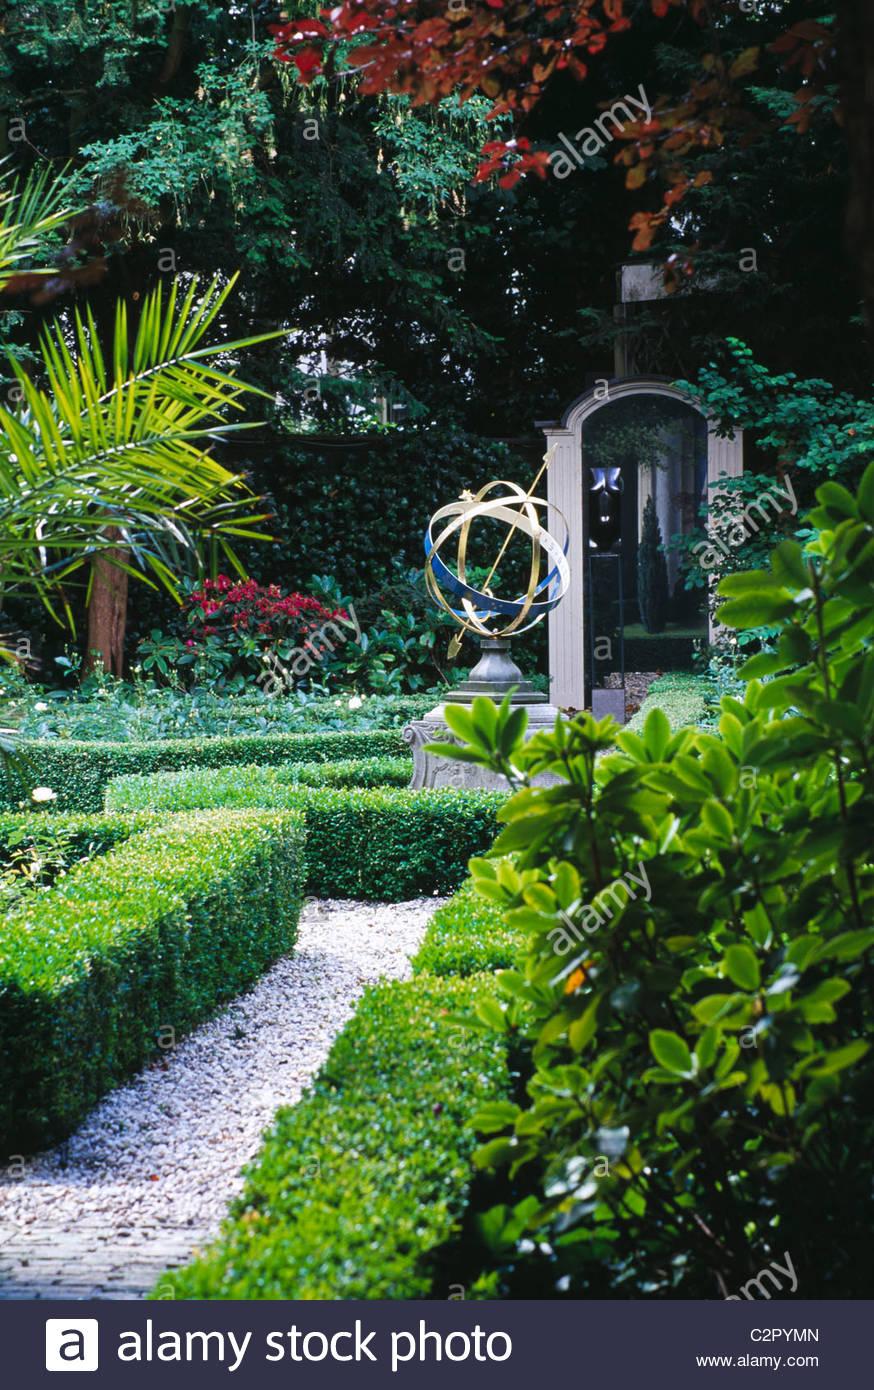 amsterdam private garden keizergracht 666 668 view along path to sculpture and trompe - Amsterdam Garden